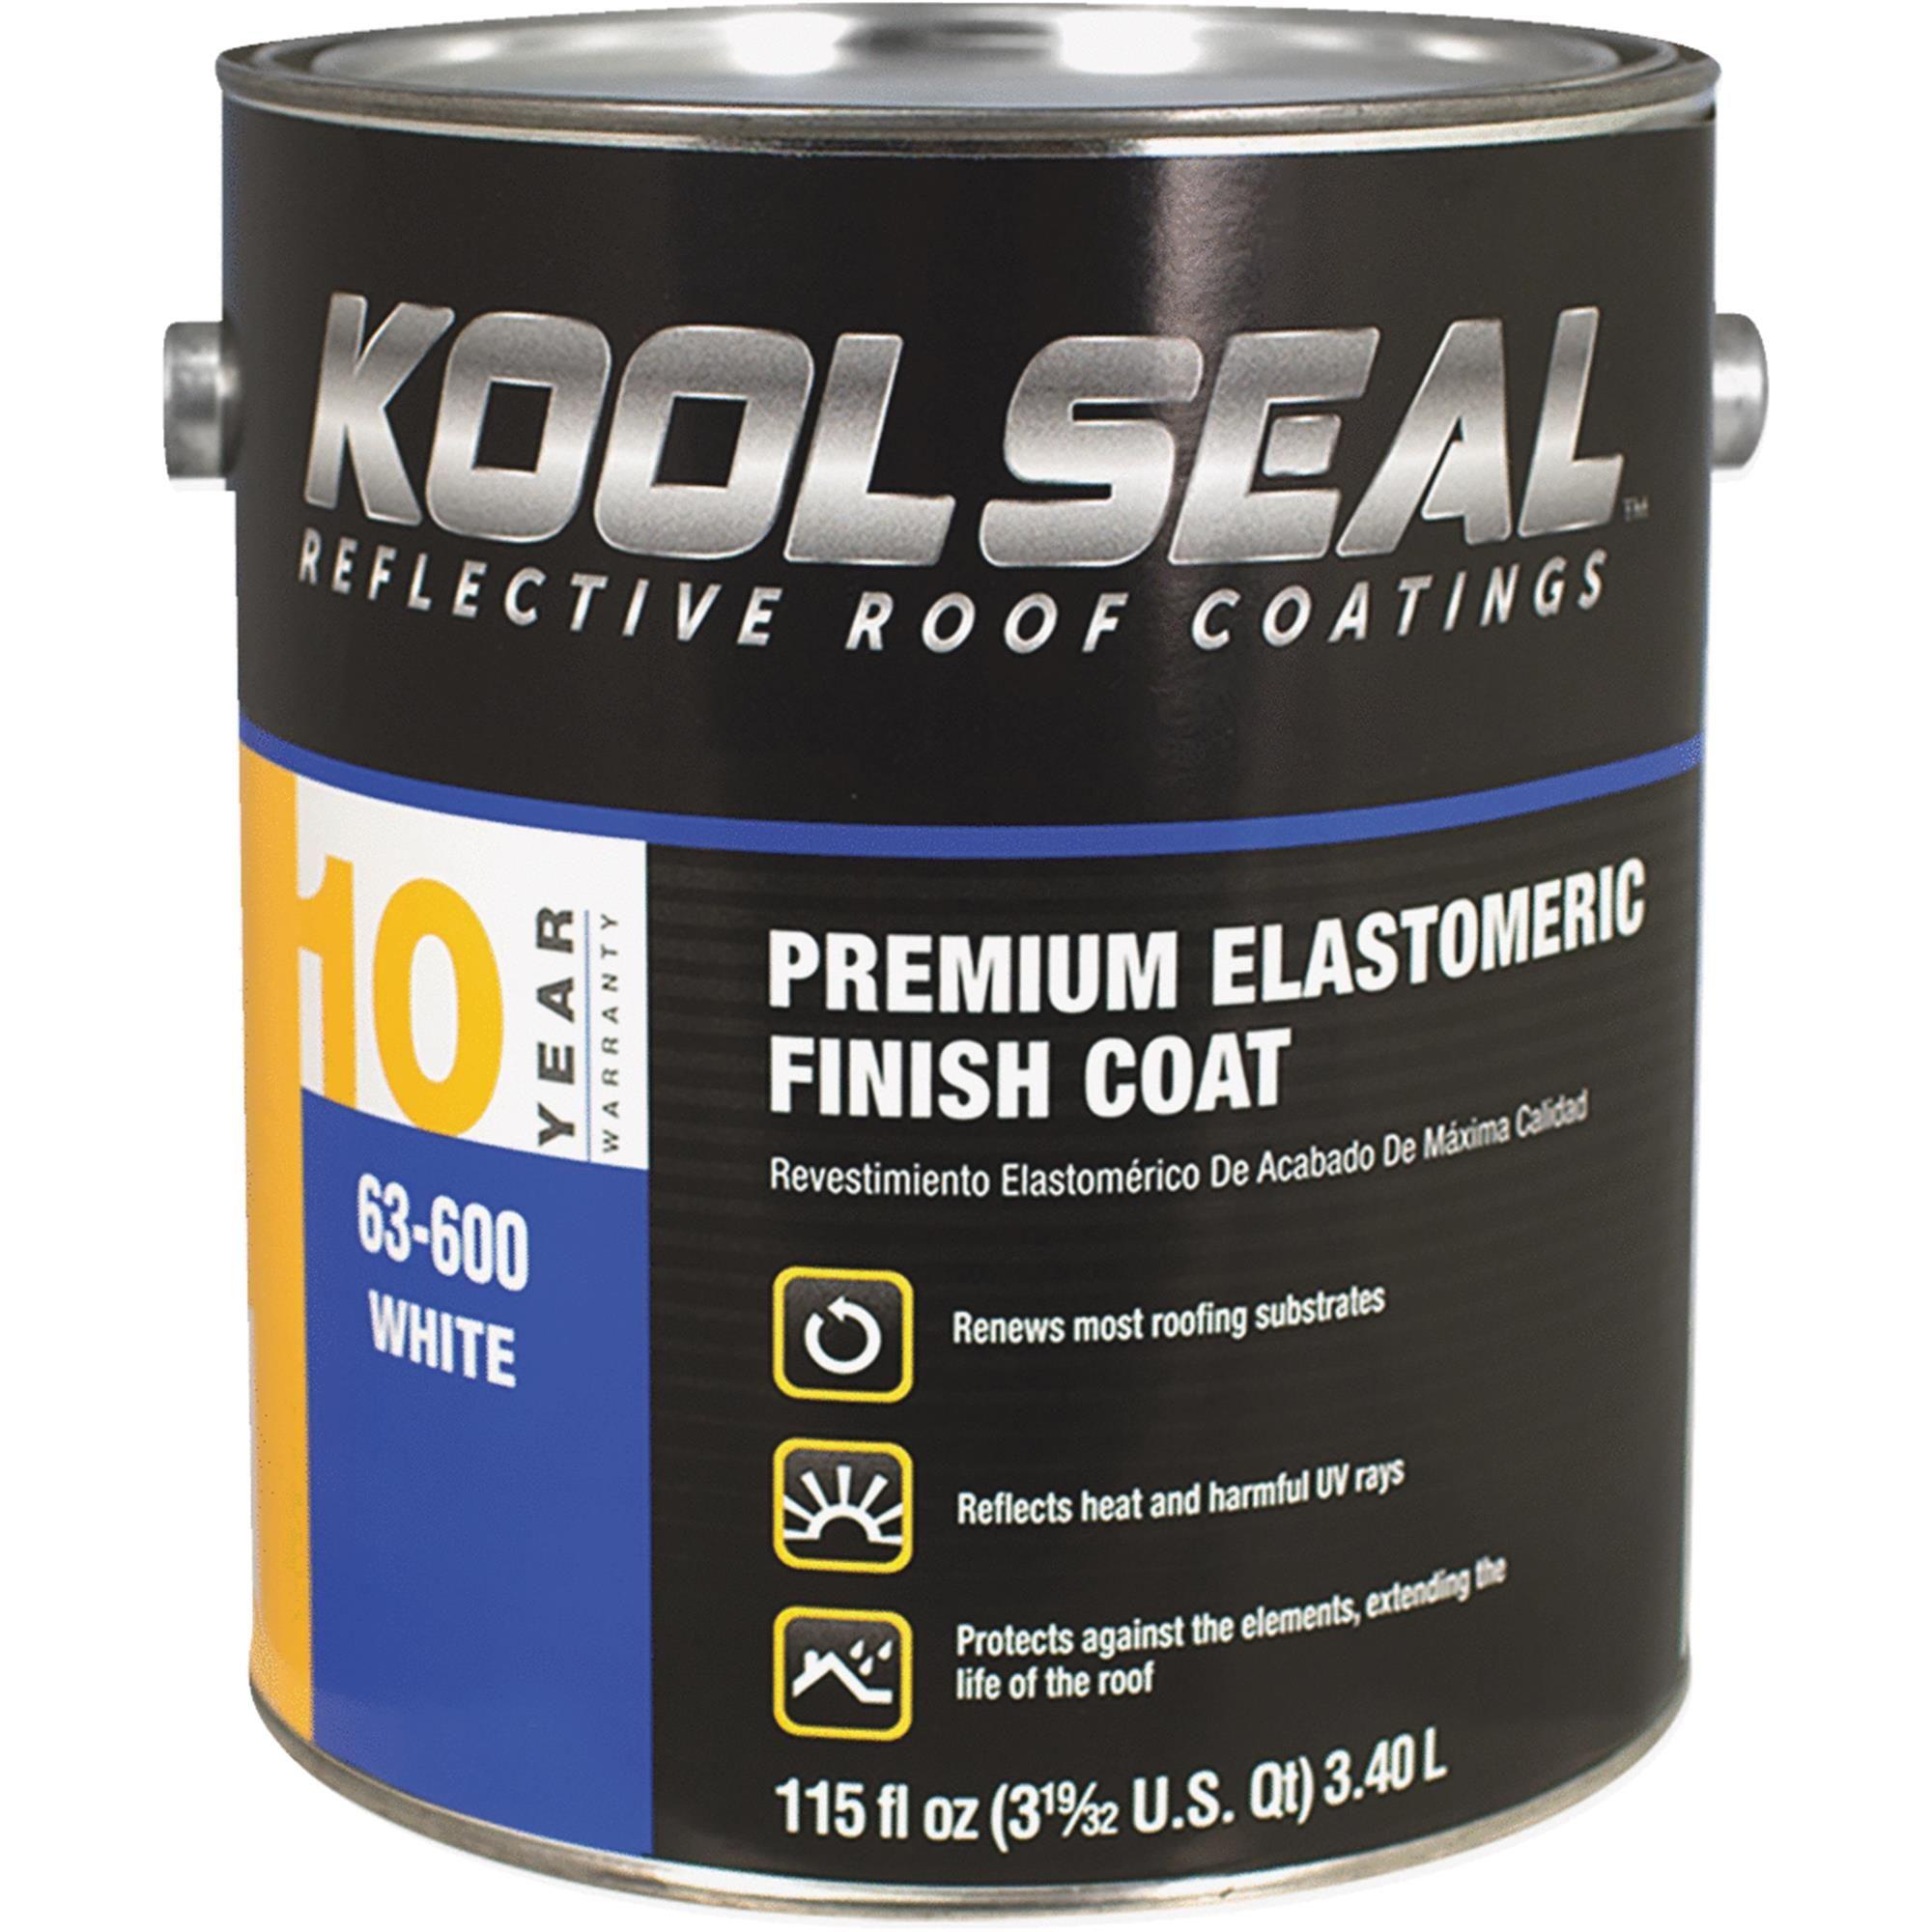 Premium White Elastomeric Roof Coating Walmart Com In 2020 Elastomeric Roof Coating Roof Coating Rubber Roof Coating